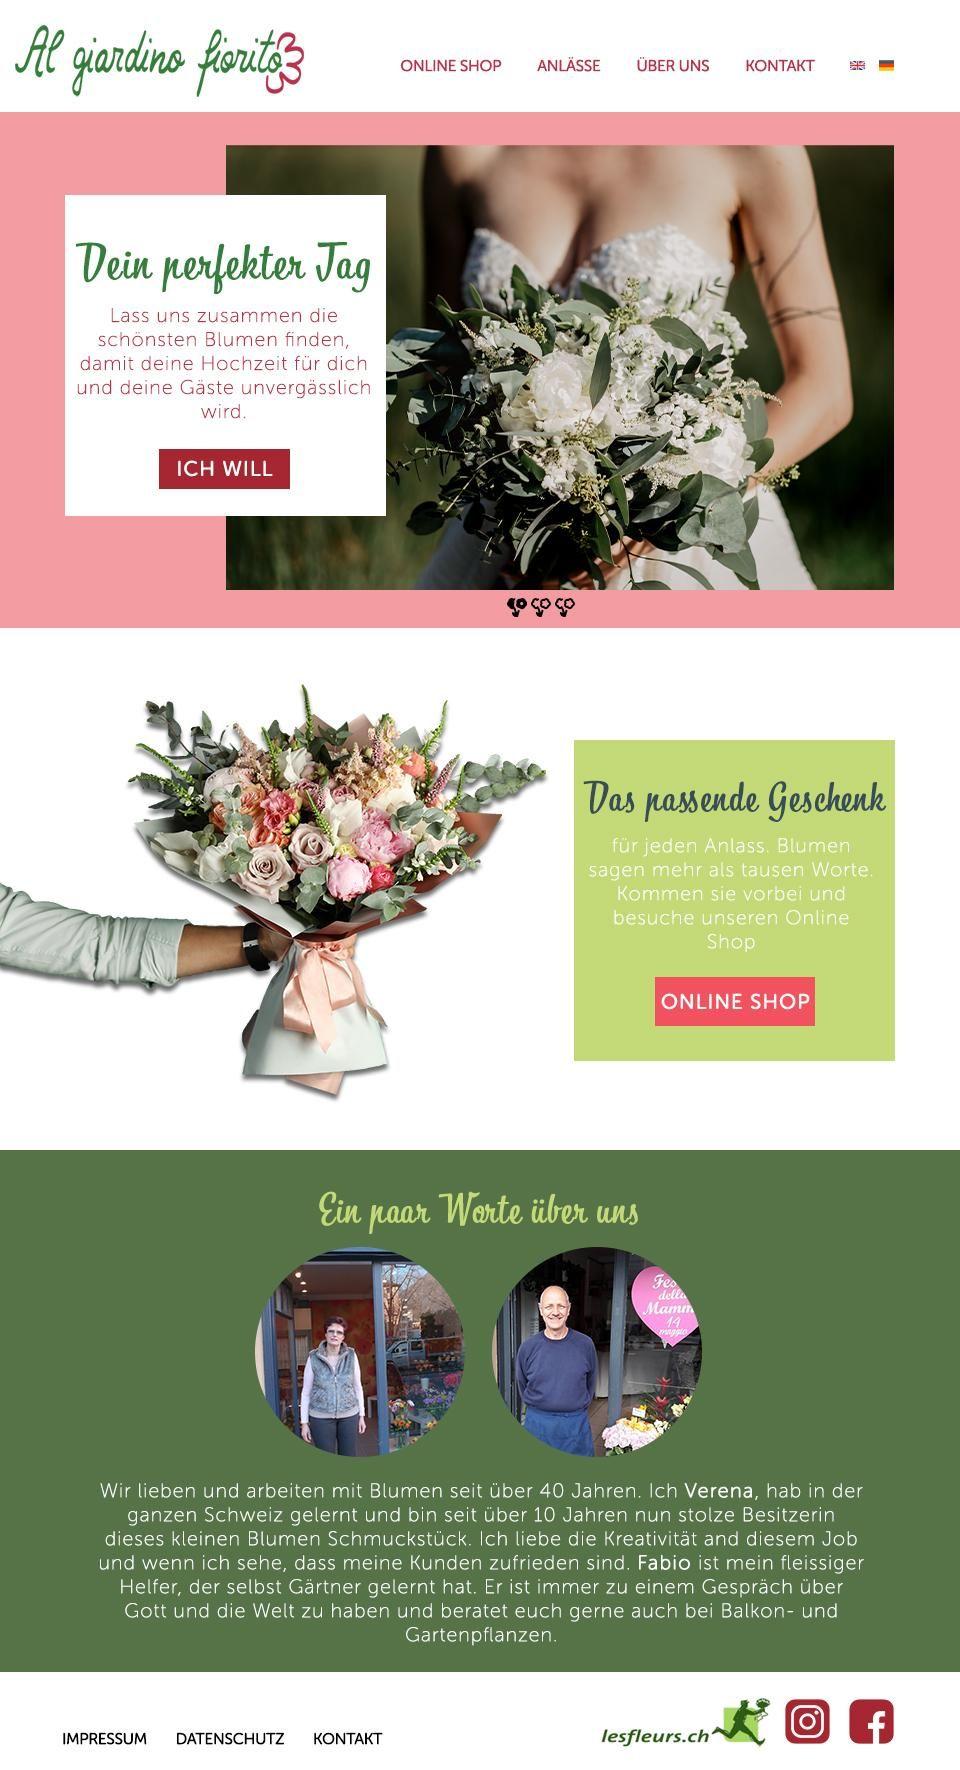 Website Flowershop - image 1 - student project